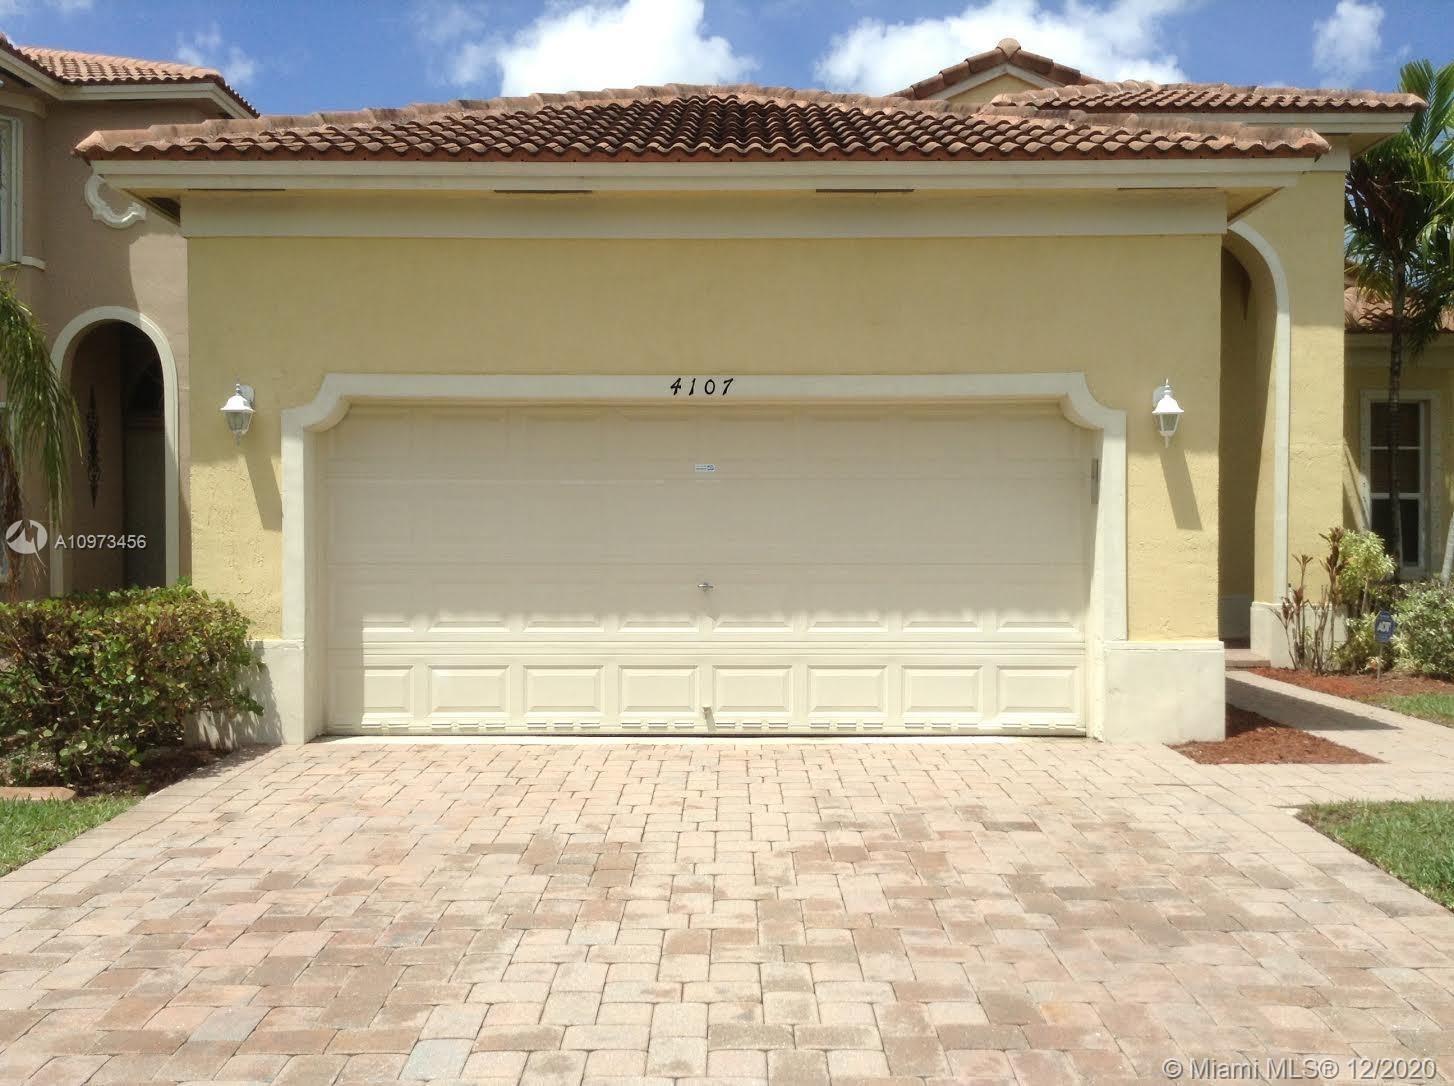 4107 NE 22nd Ct, Homestead, FL 33033 - #: A10973456